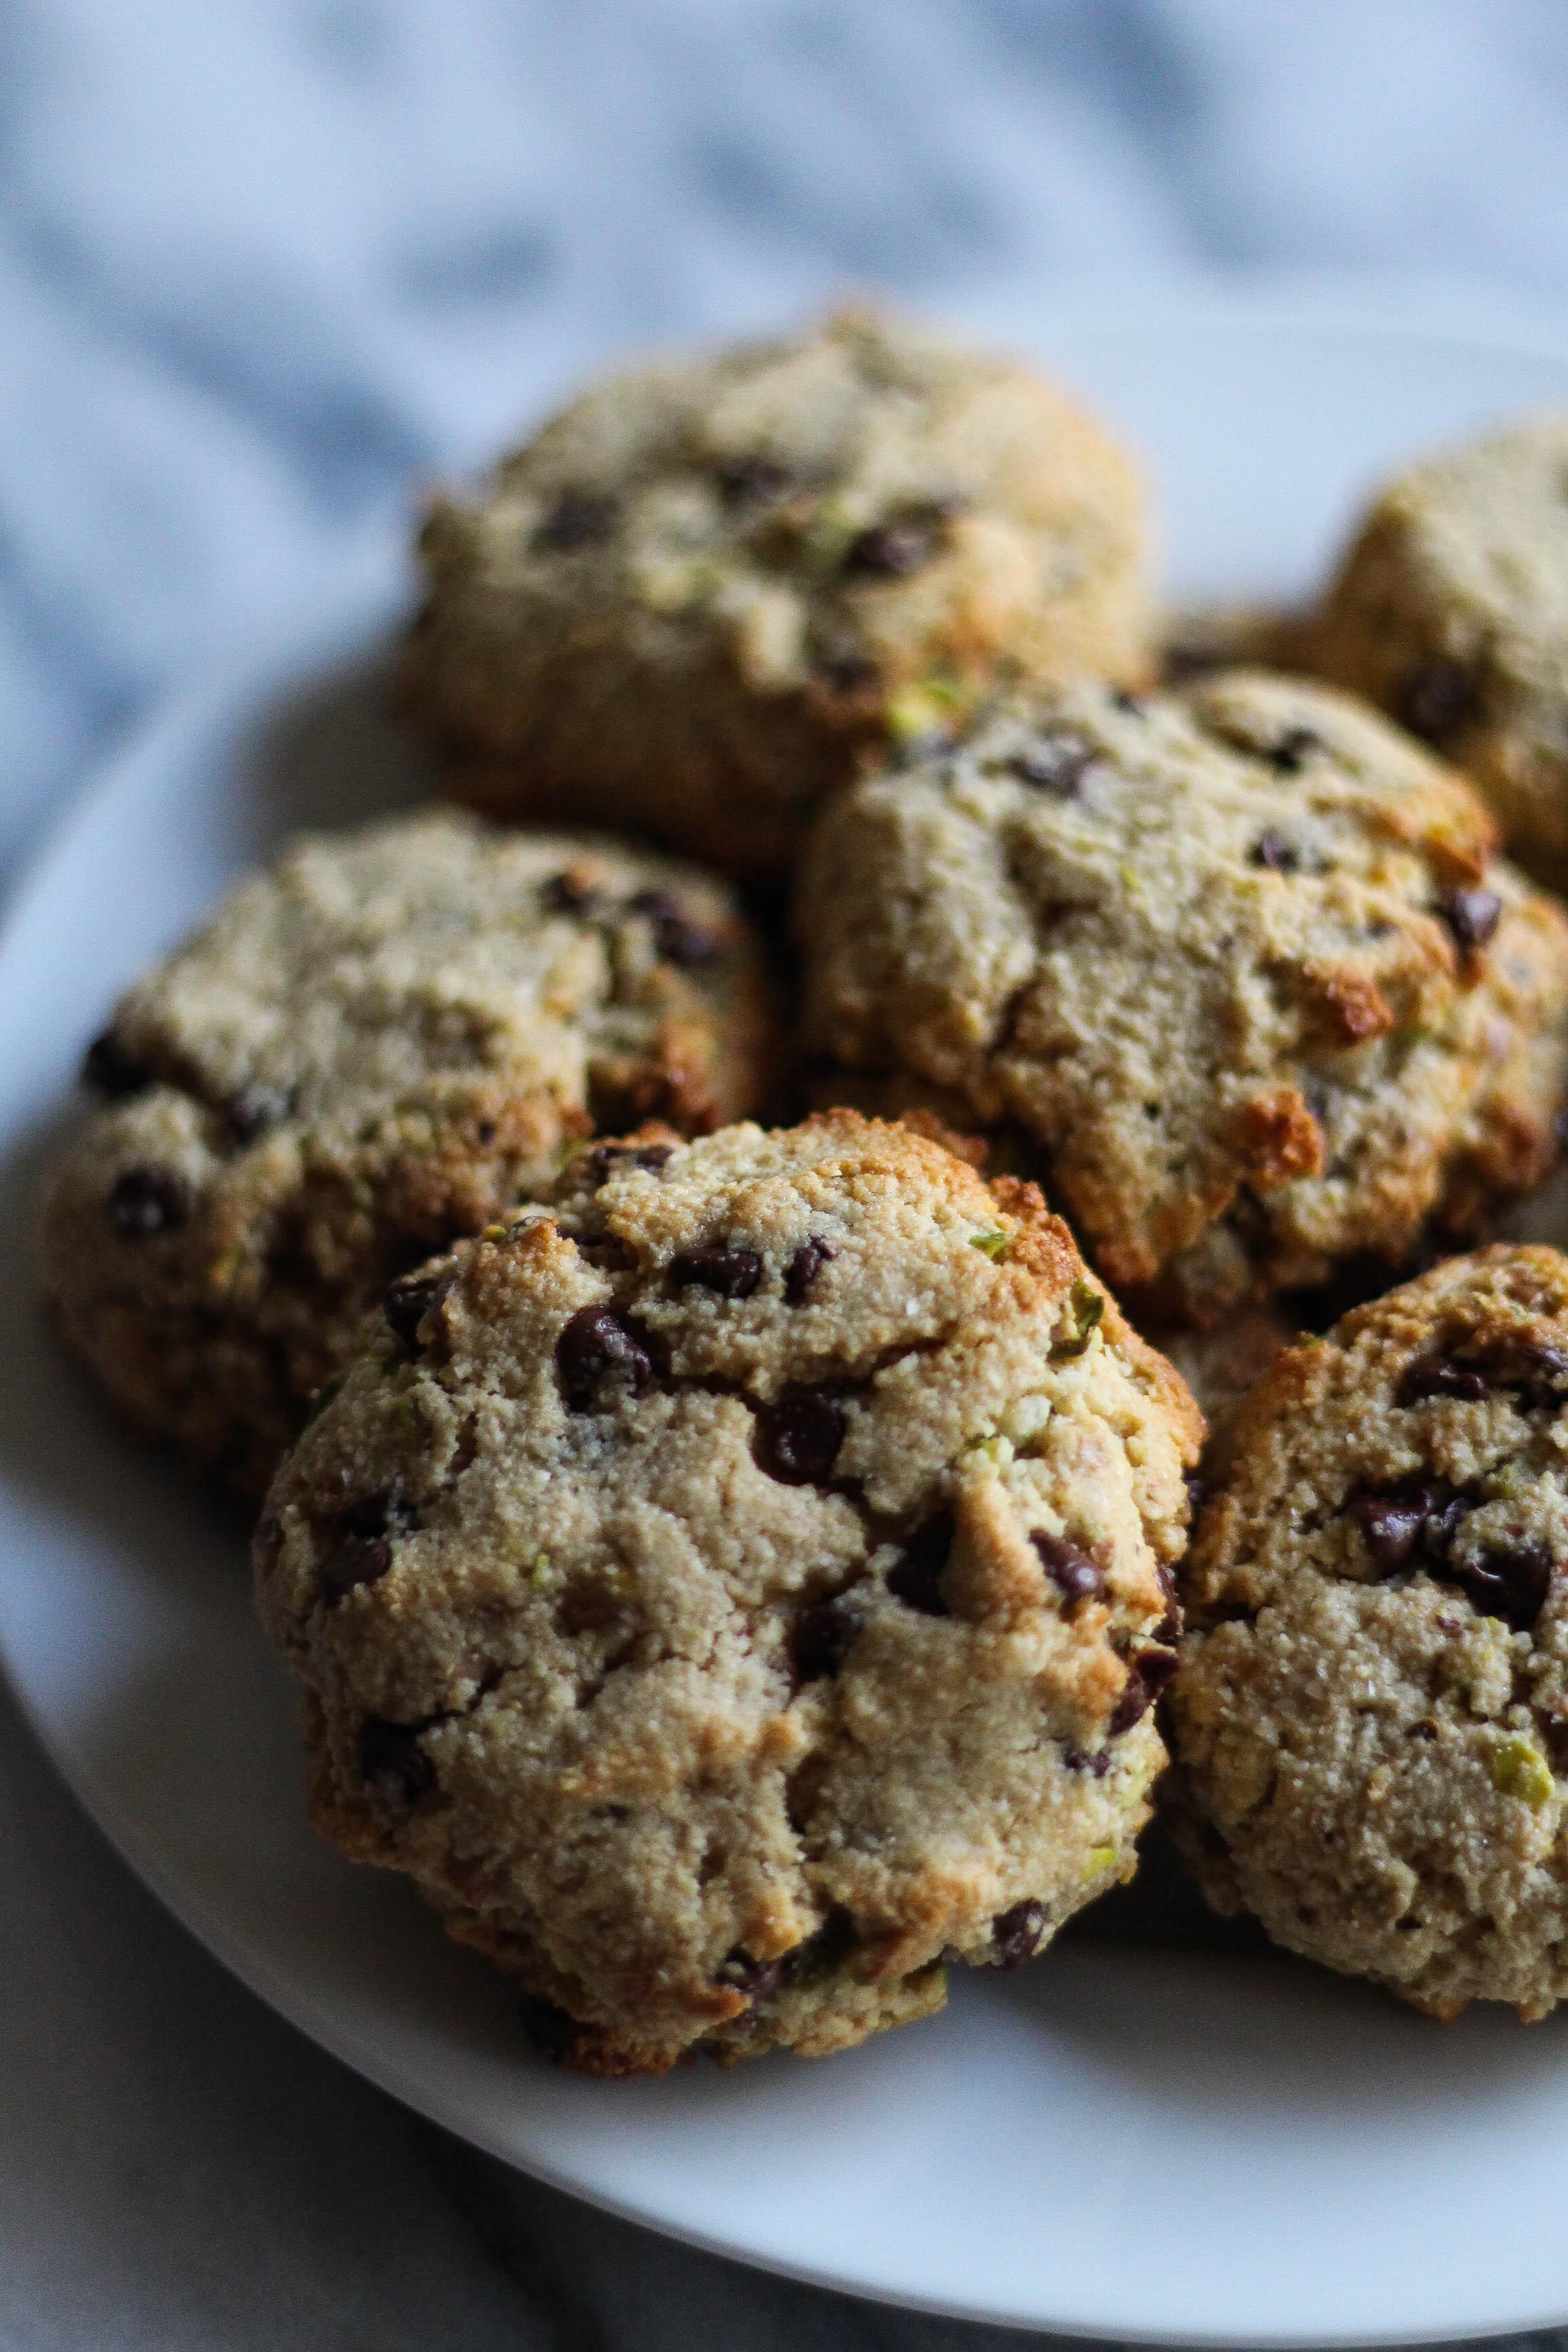 Gluten-Free Ricotta-Stuffed Pistachio Chocolate Chip Cookies